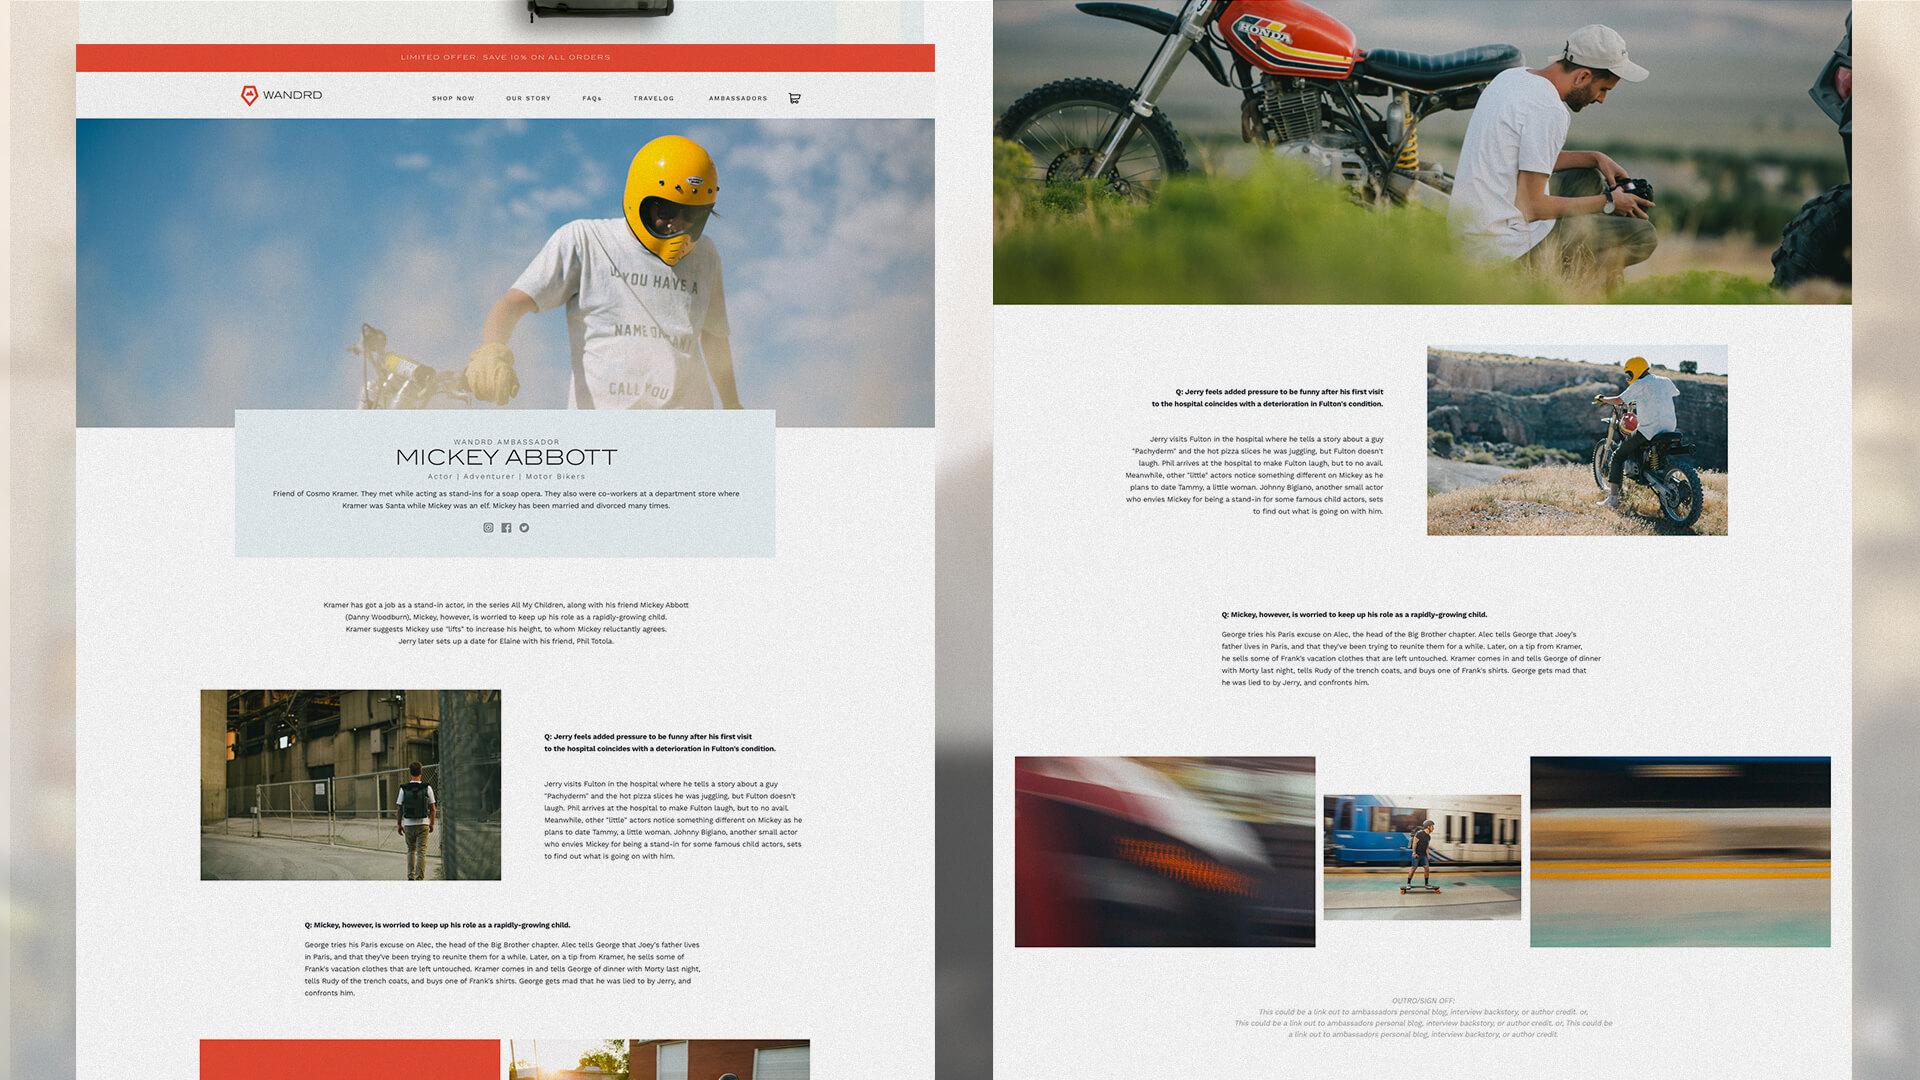 Website design, ambassador profile - Wandrd